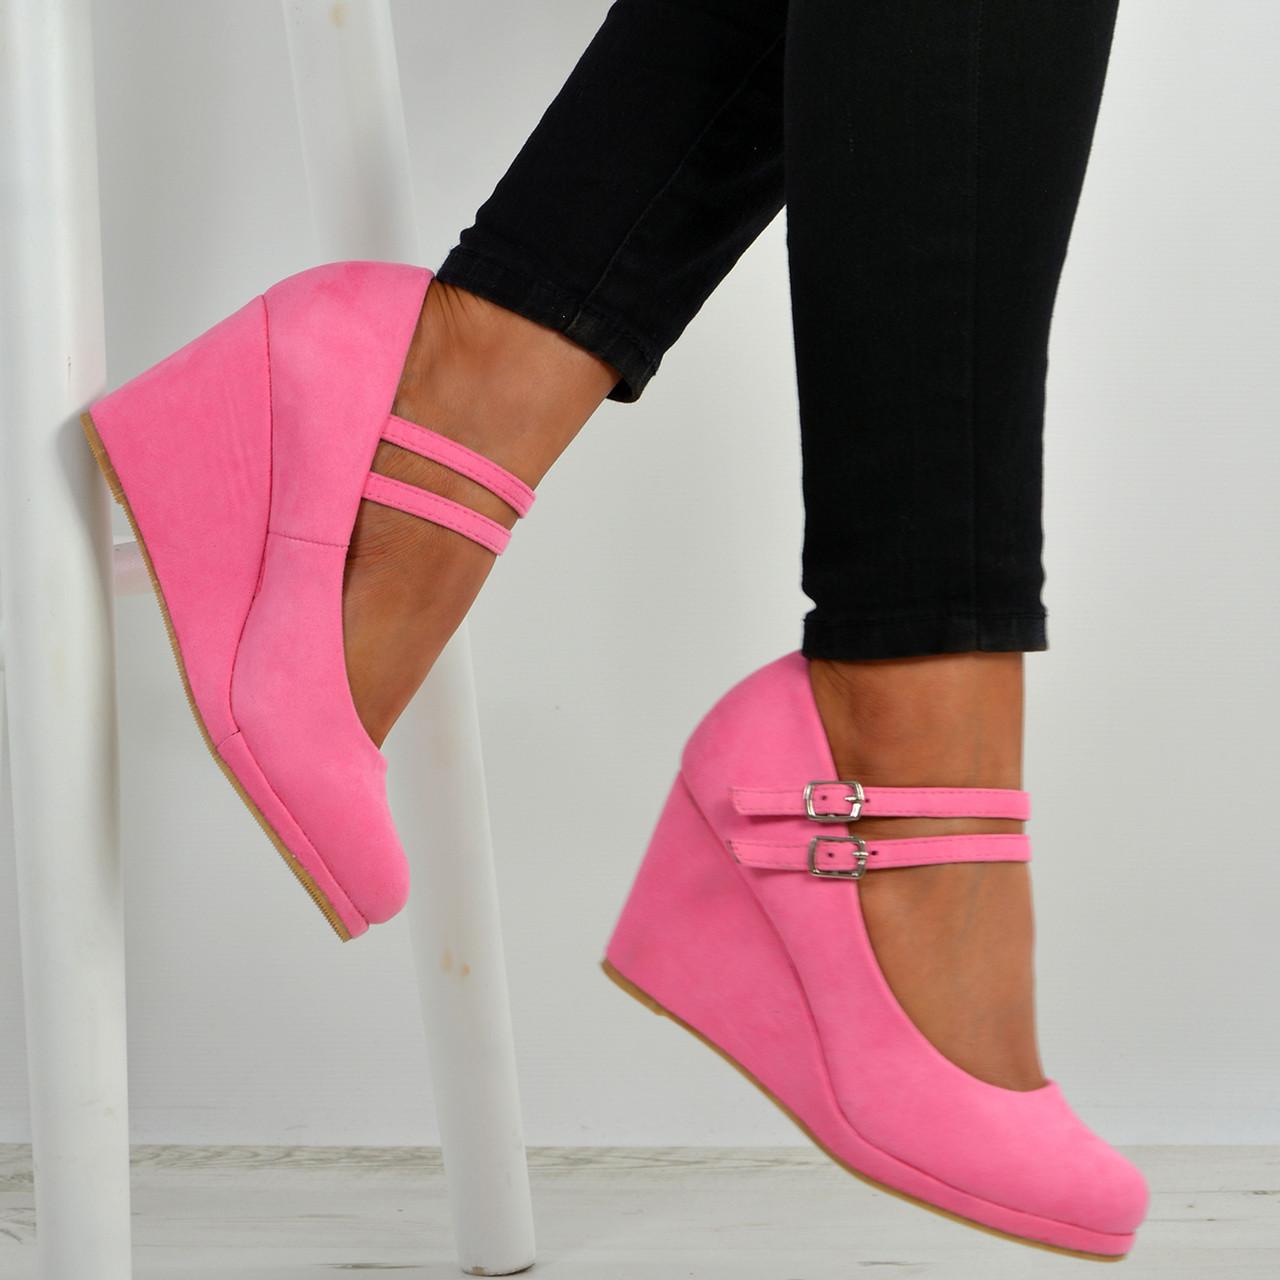 e5ce2b70a9 Womens Ladies High Wedge Heel Pumps Platform Double Strap Shoes Size Uk 3-8